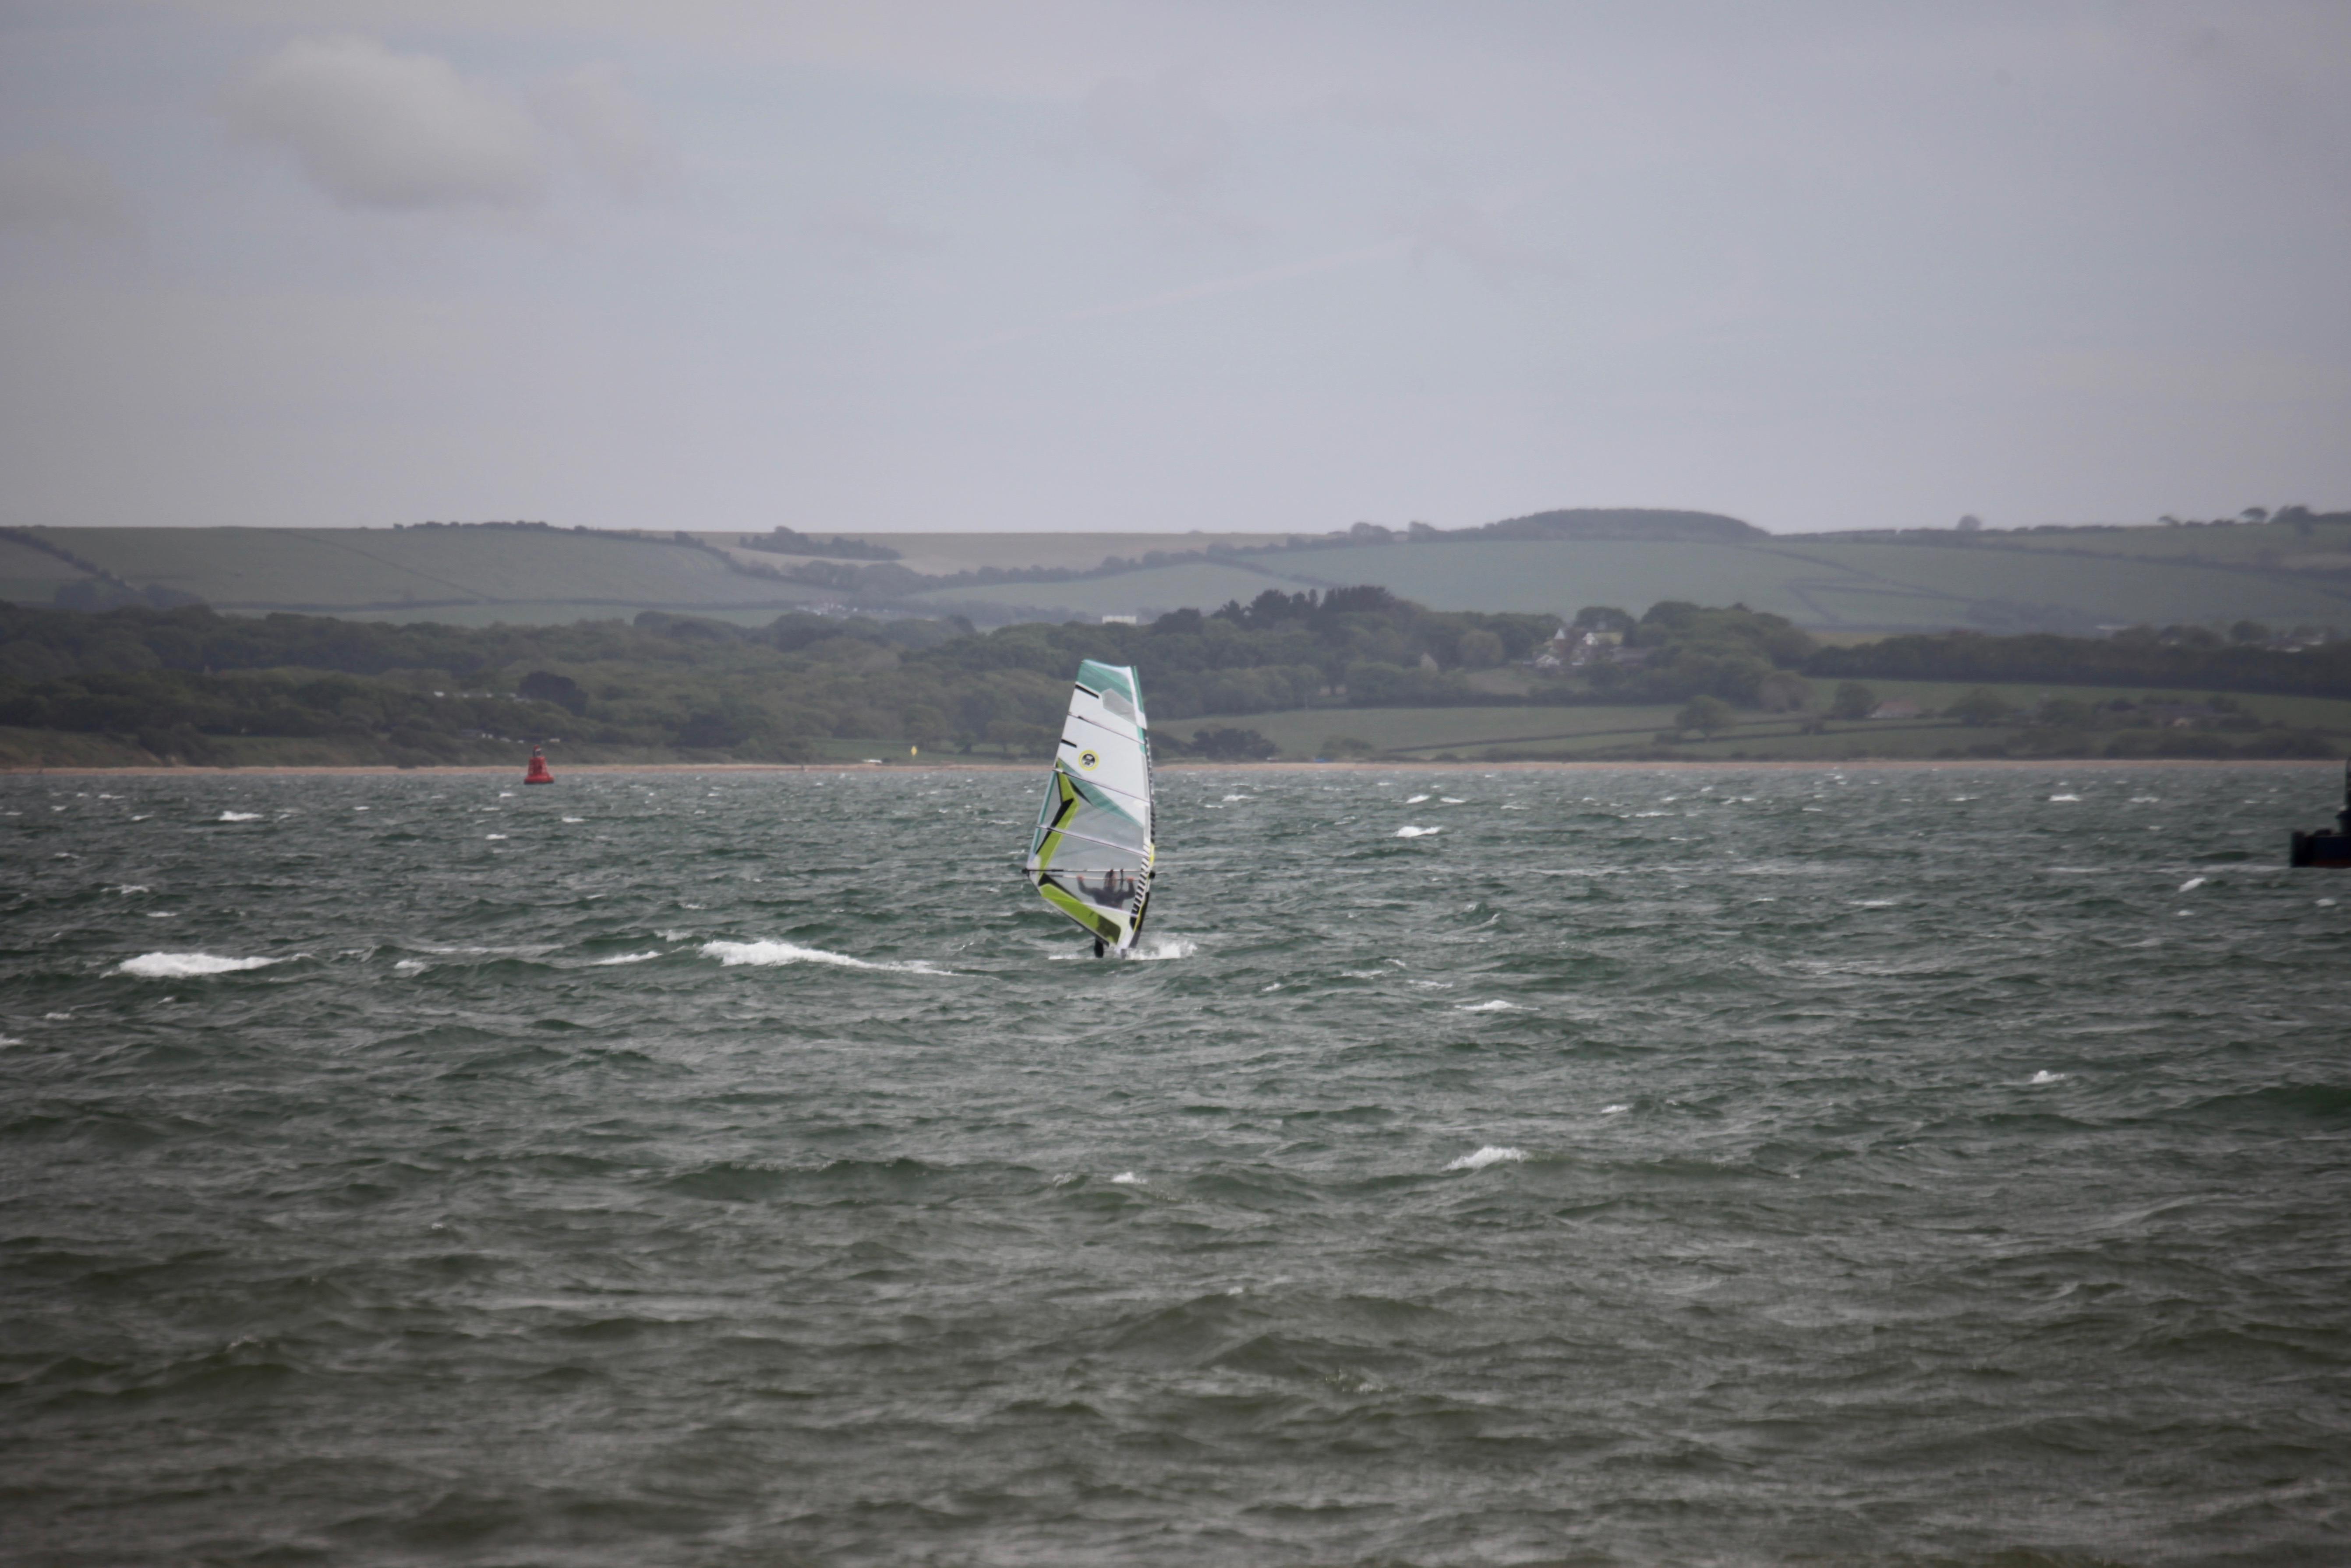 Water skier, Isle of Wight